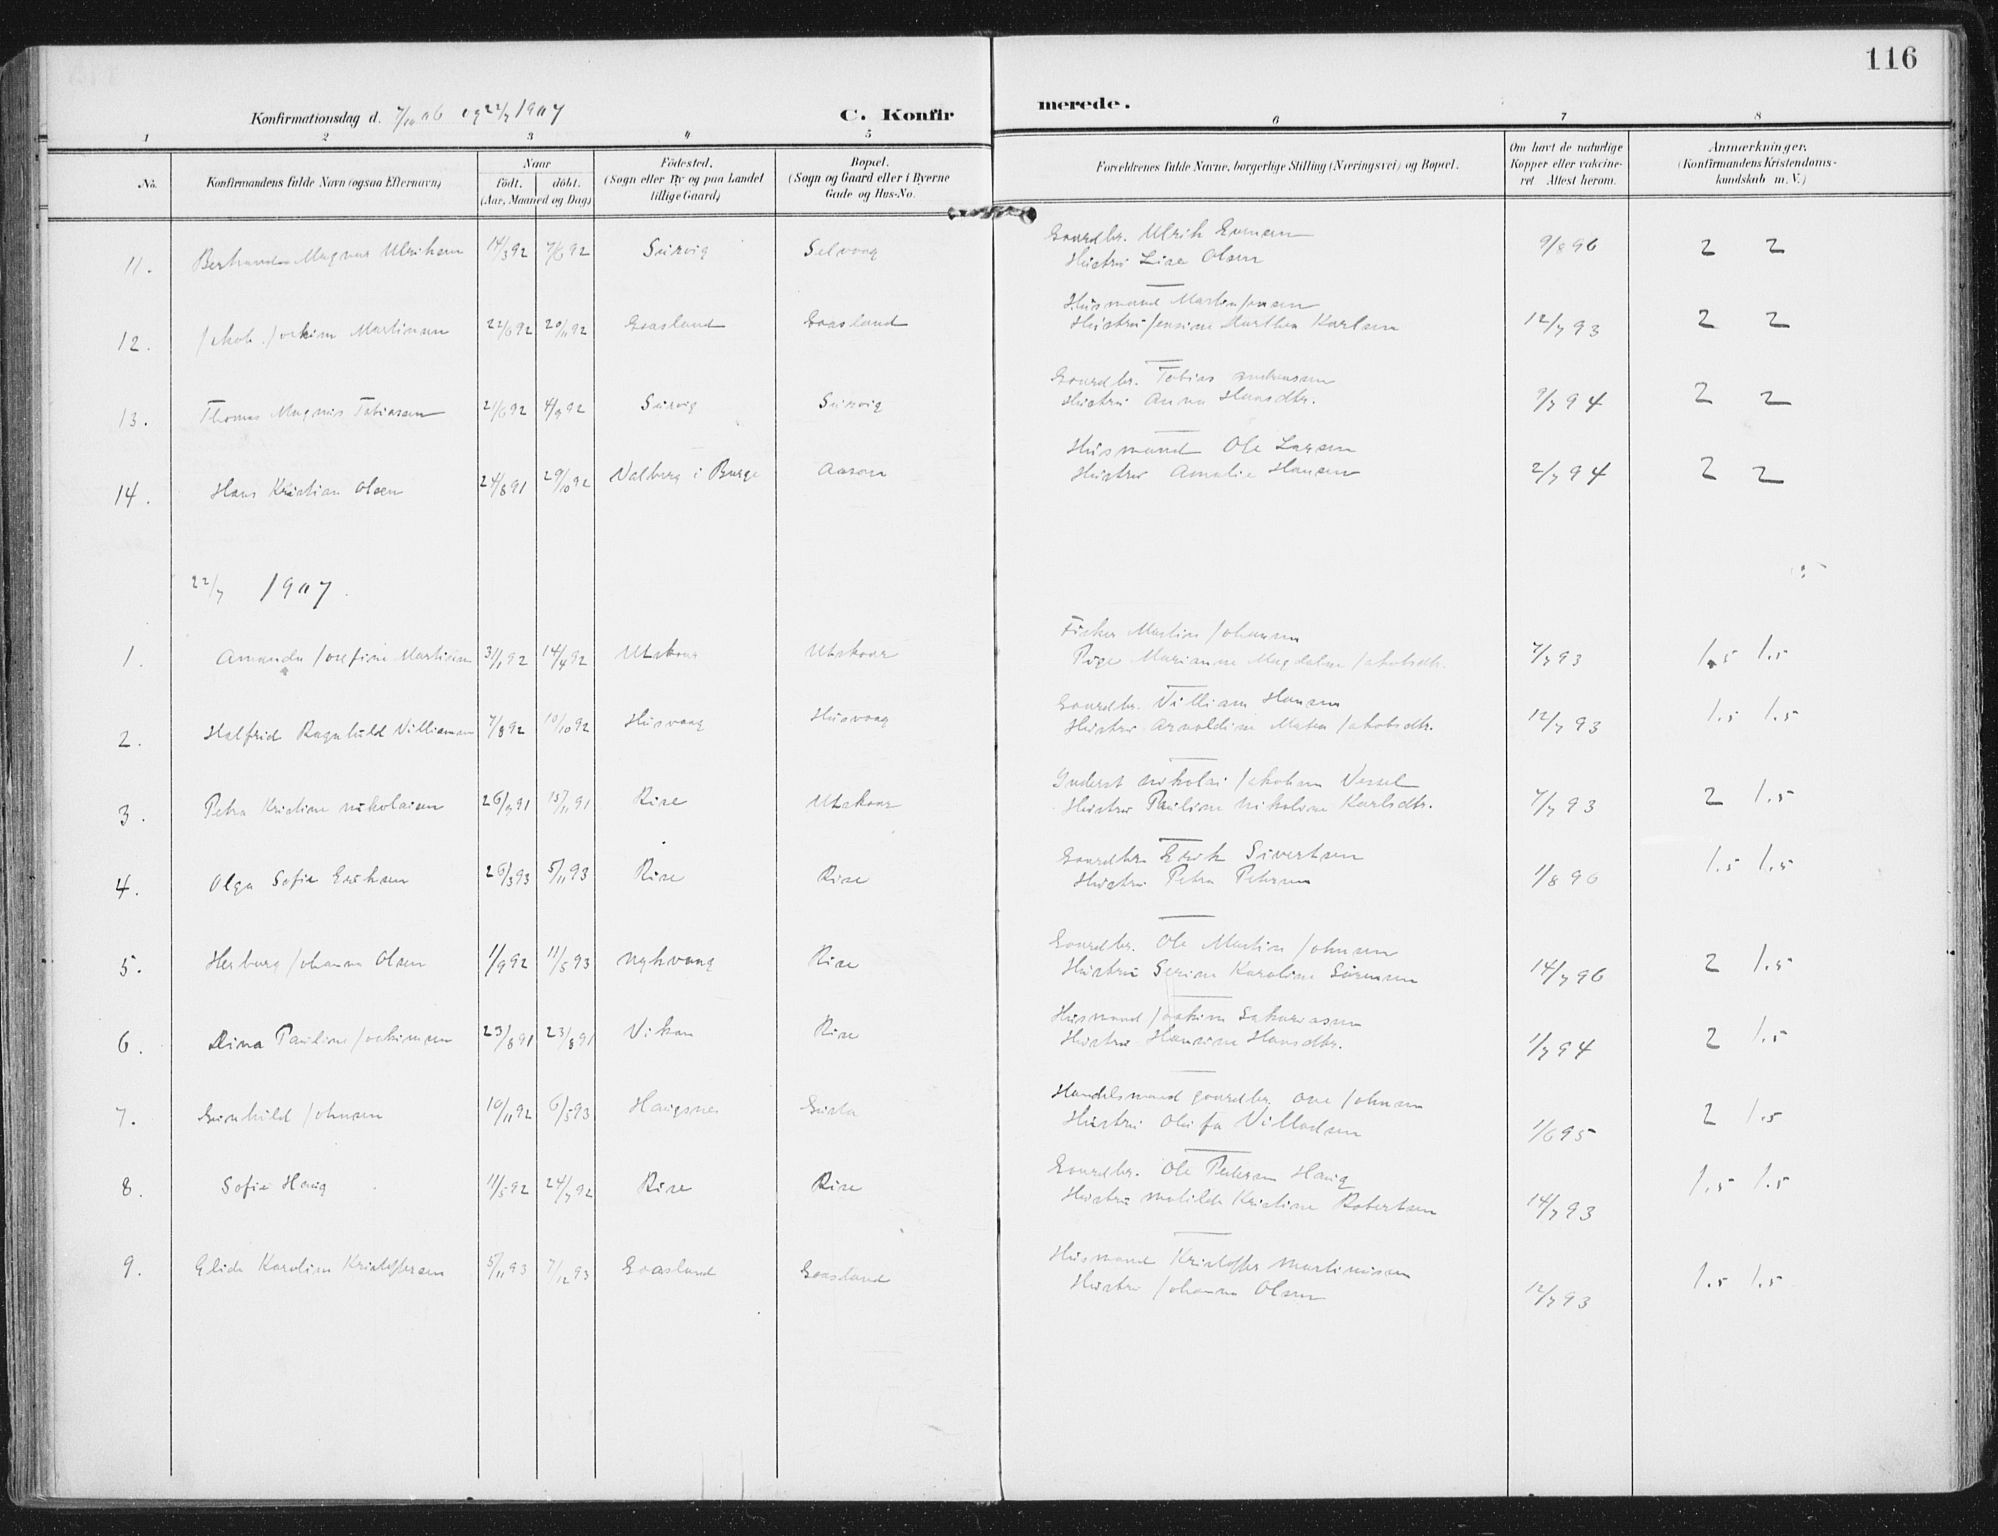 SAT, Ministerialprotokoller, klokkerbøker og fødselsregistre - Nordland, 892/L1321: Ministerialbok nr. 892A02, 1902-1918, s. 116